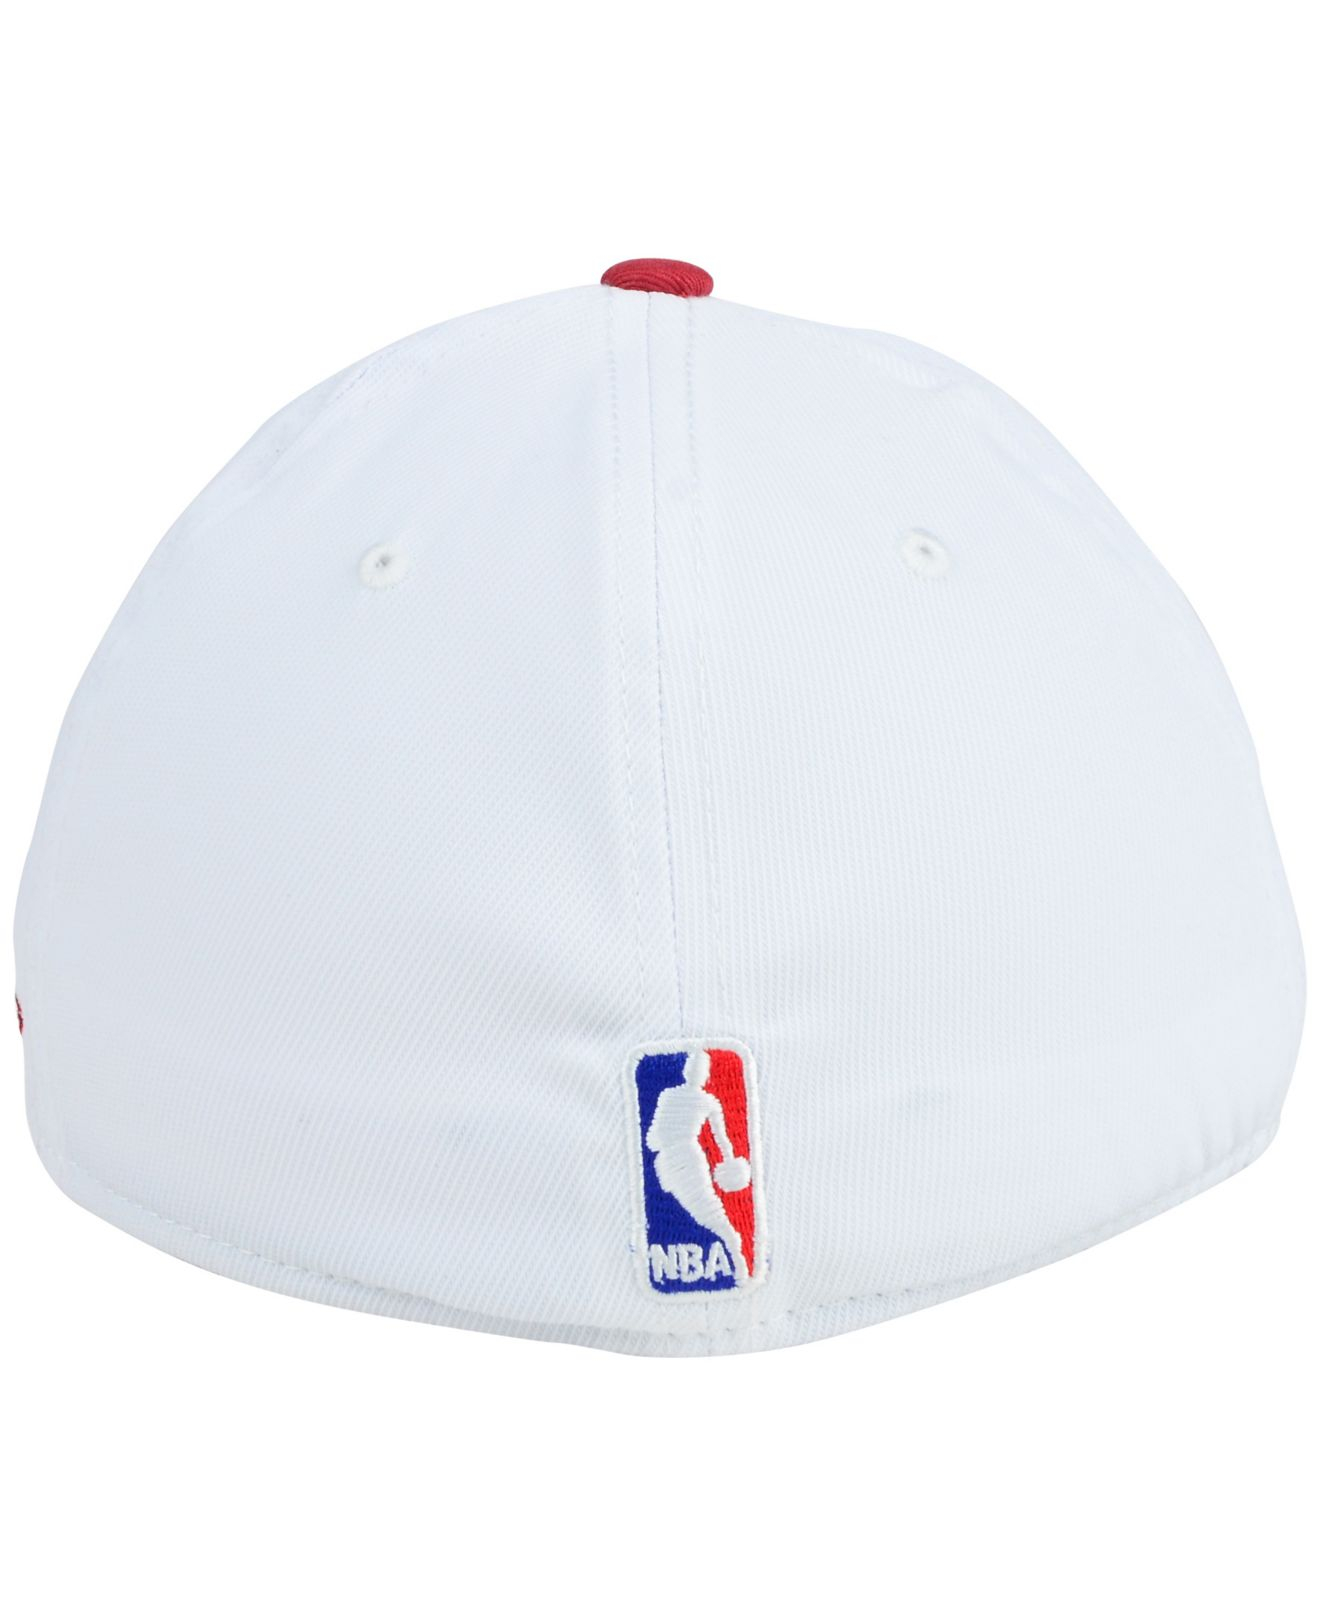 the best attitude 852f0 639c3 ... inexpensive lyst adidas miami heat nba timeout flex cap in white for men  ec6bc b0481